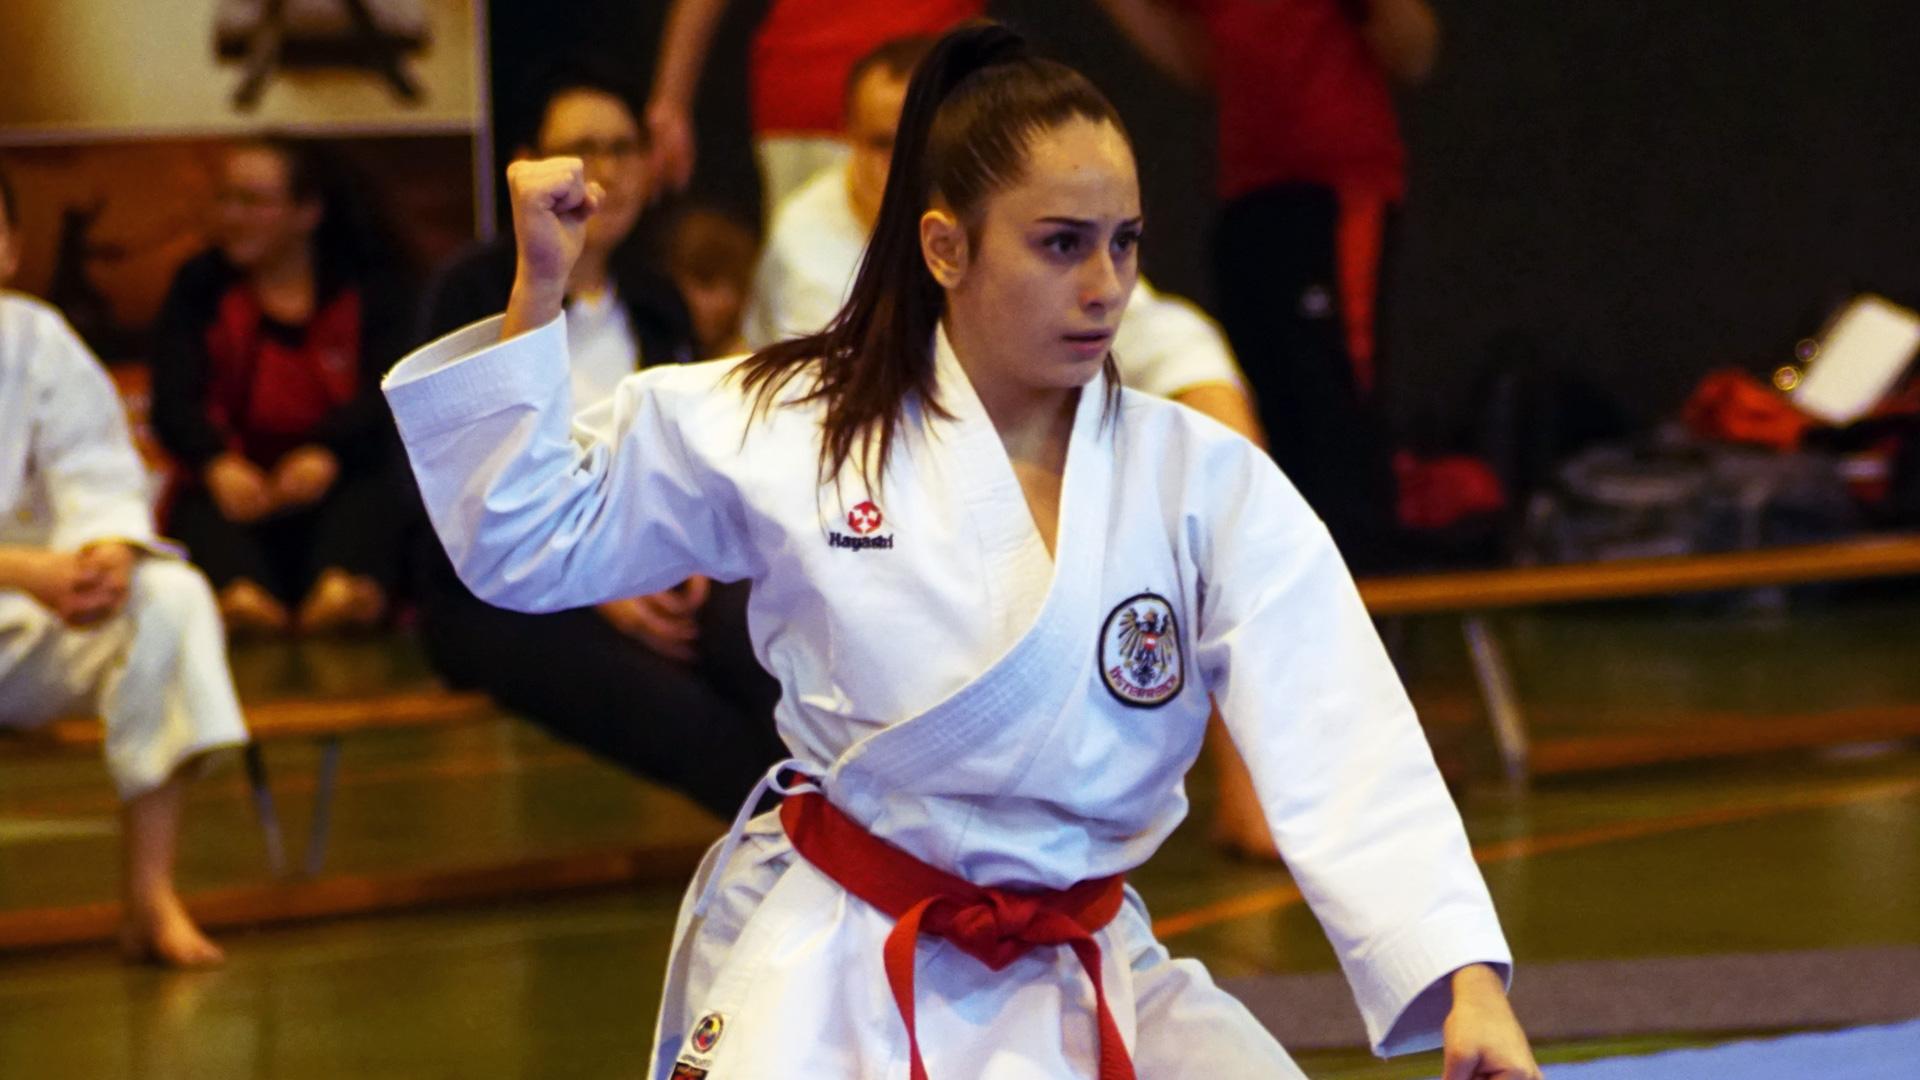 Karate Kämpferin in Karate Gi, roter Gurt